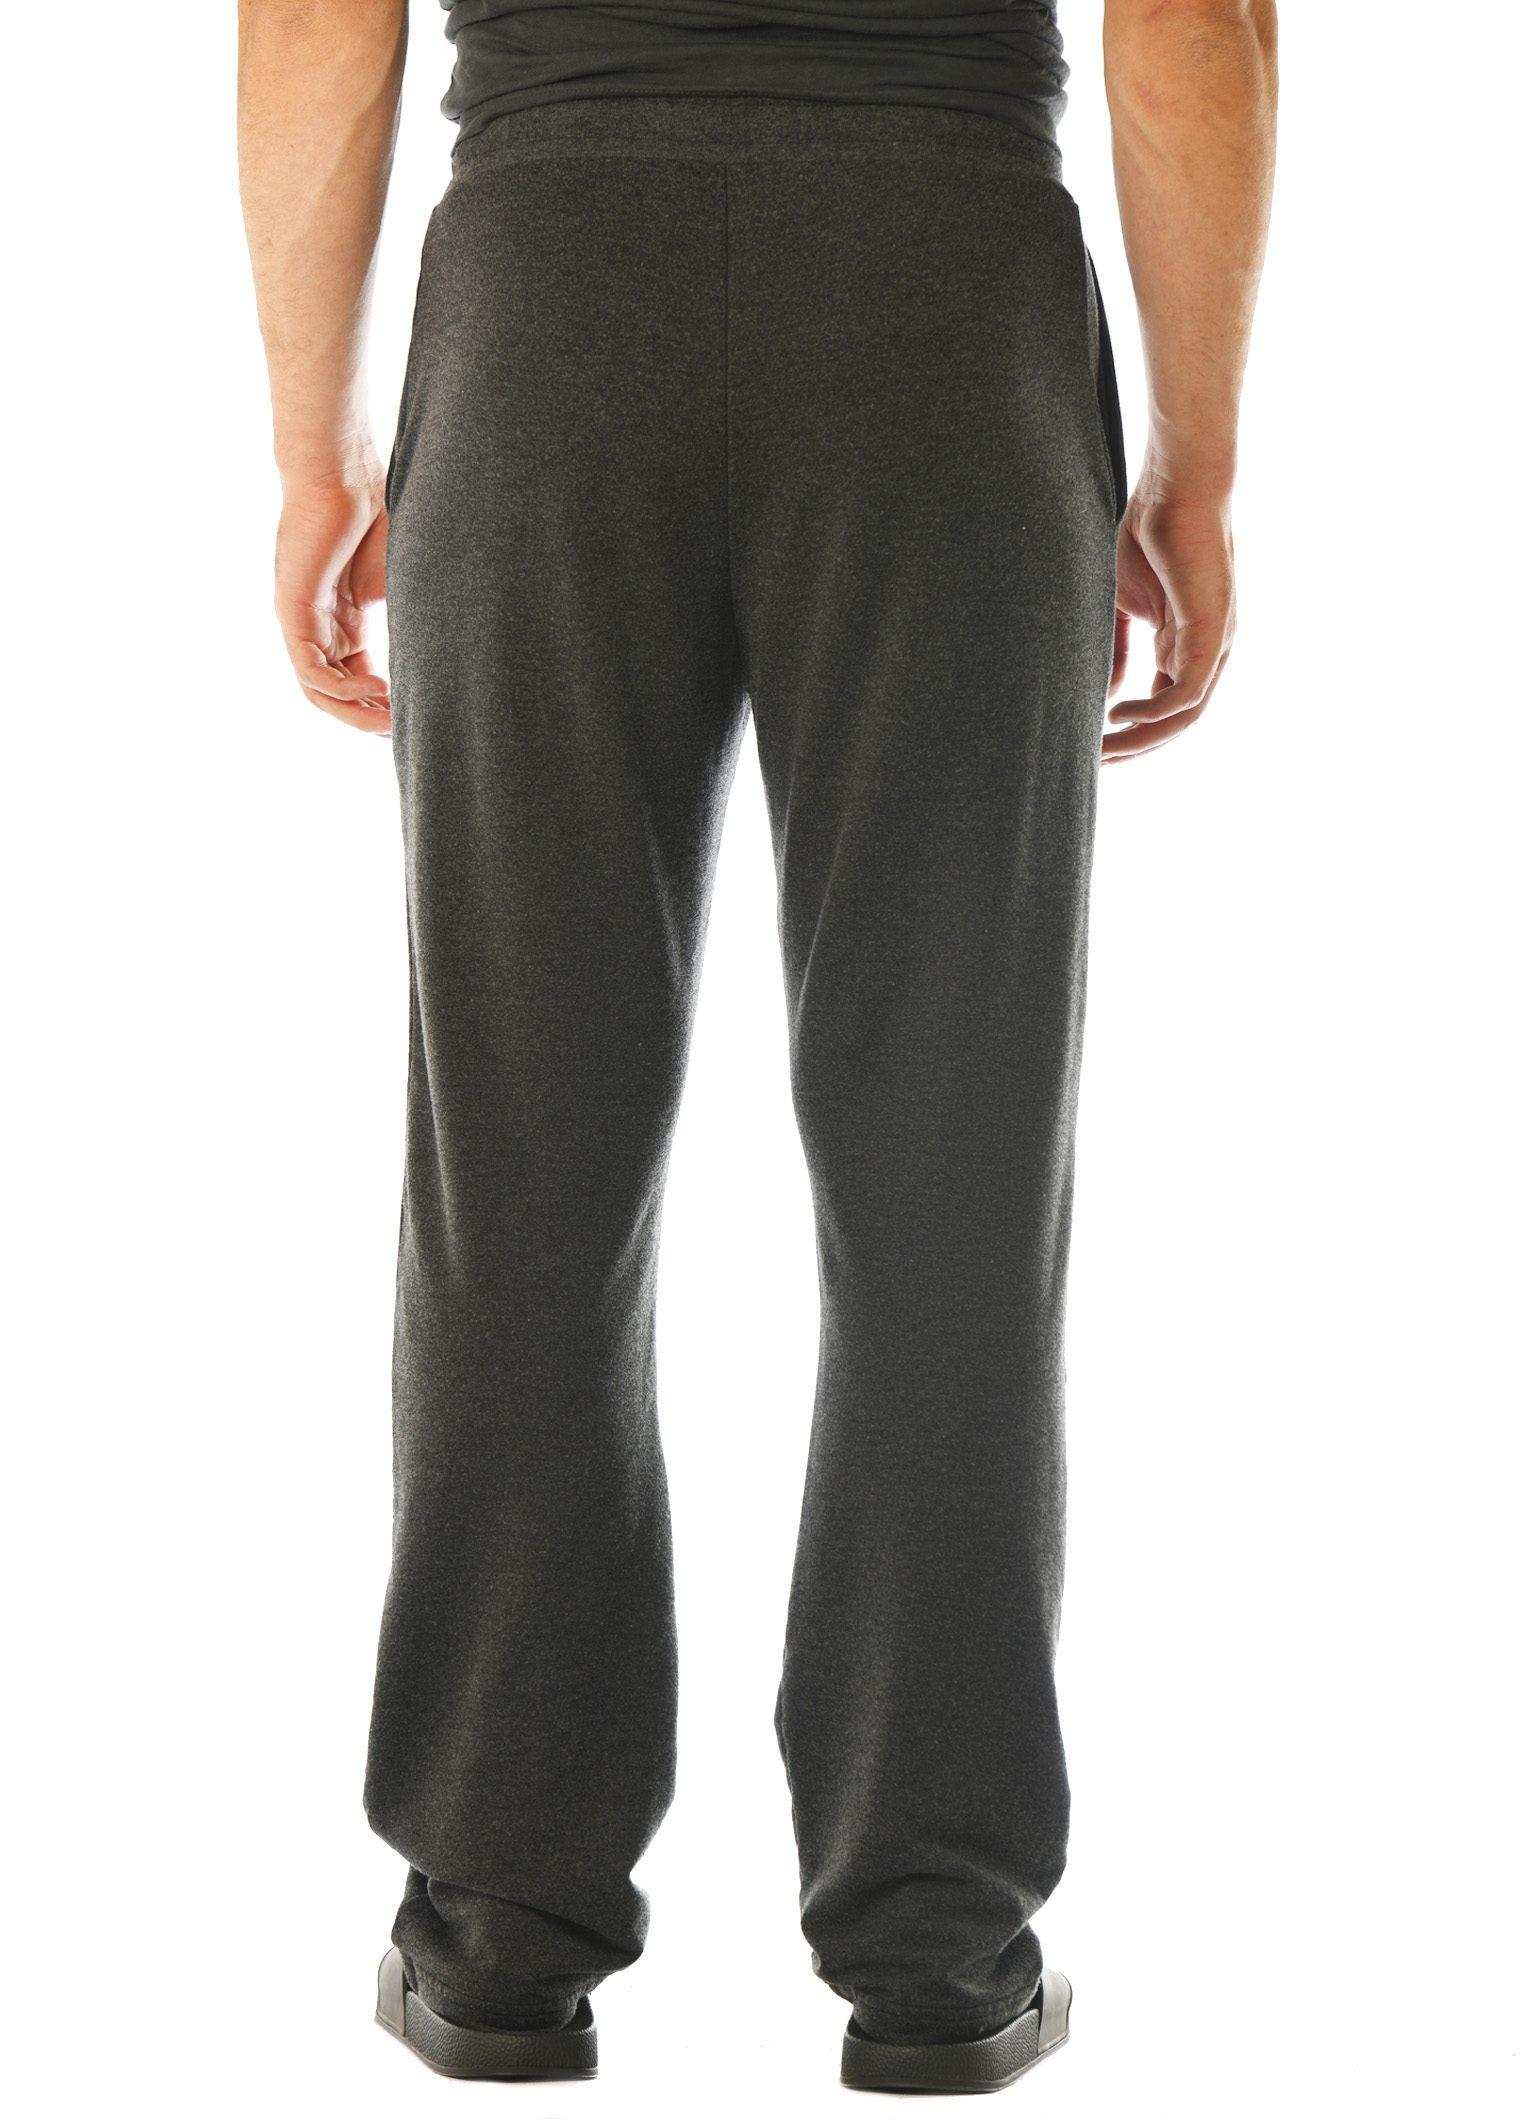 GG 310 Men's Chill Pants back clean